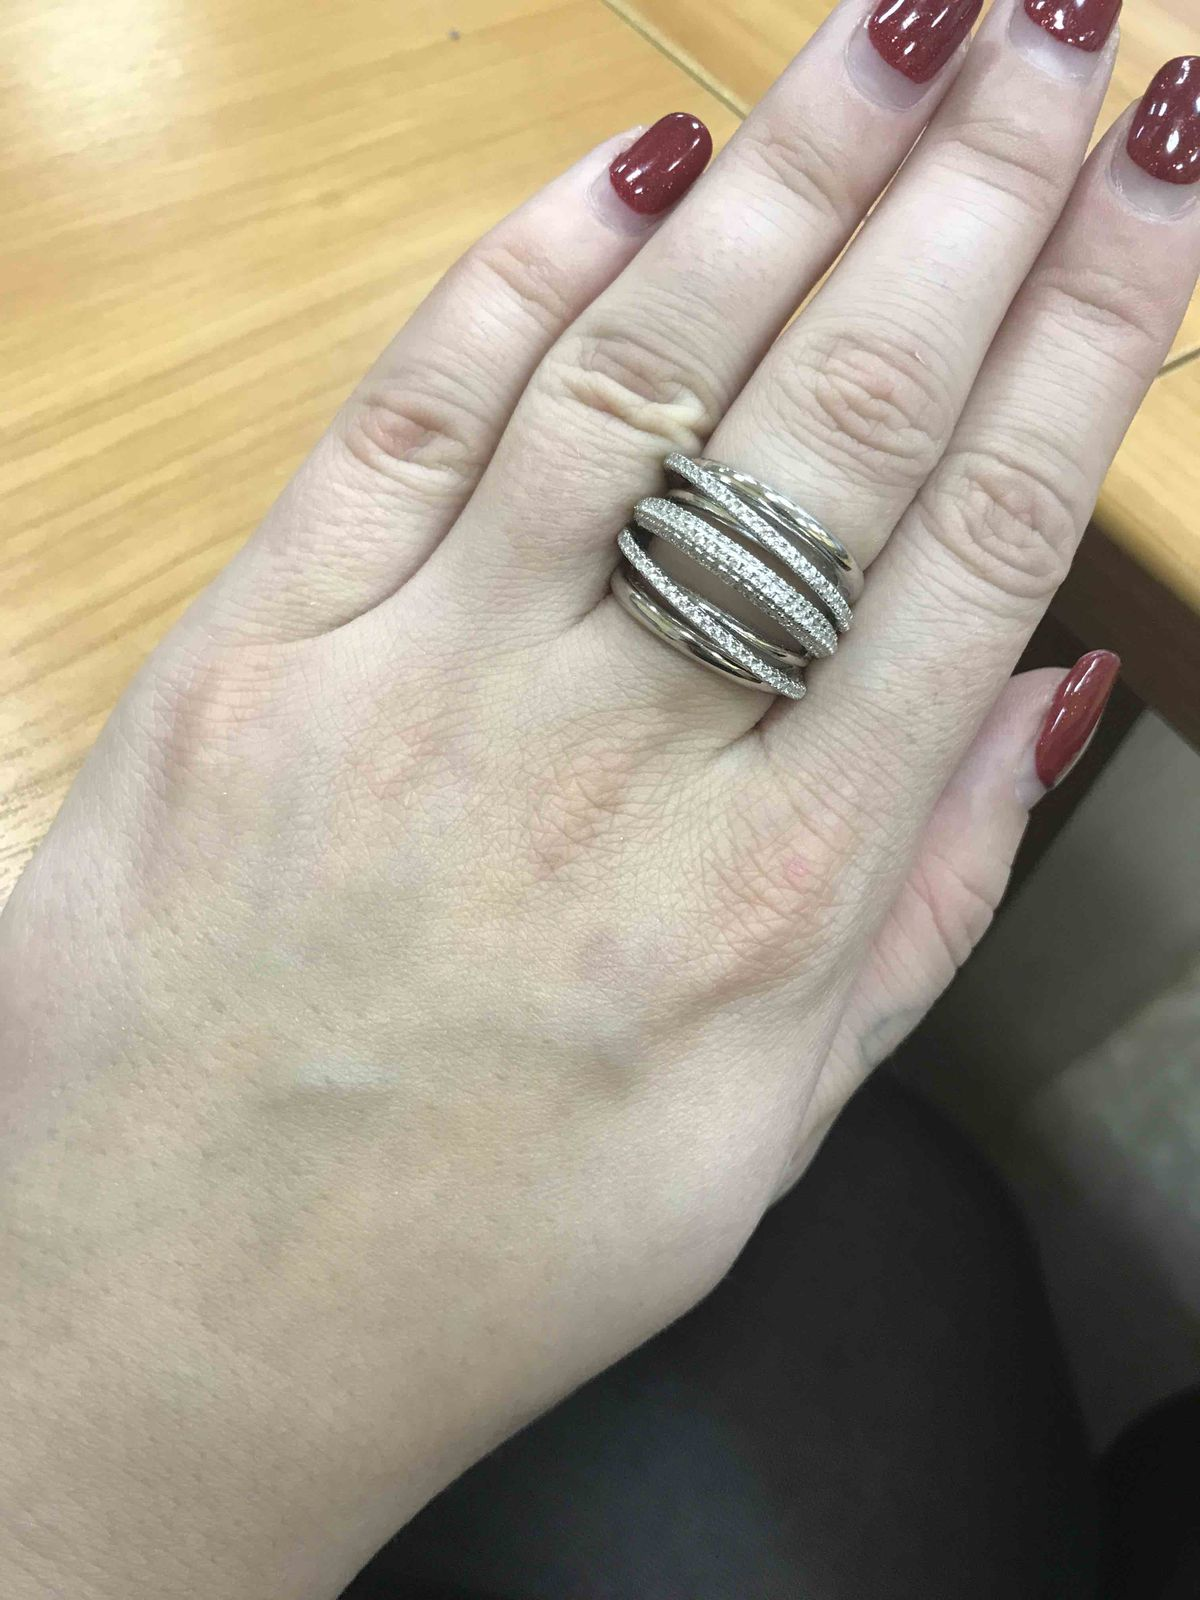 Потрясное кольцо!!!